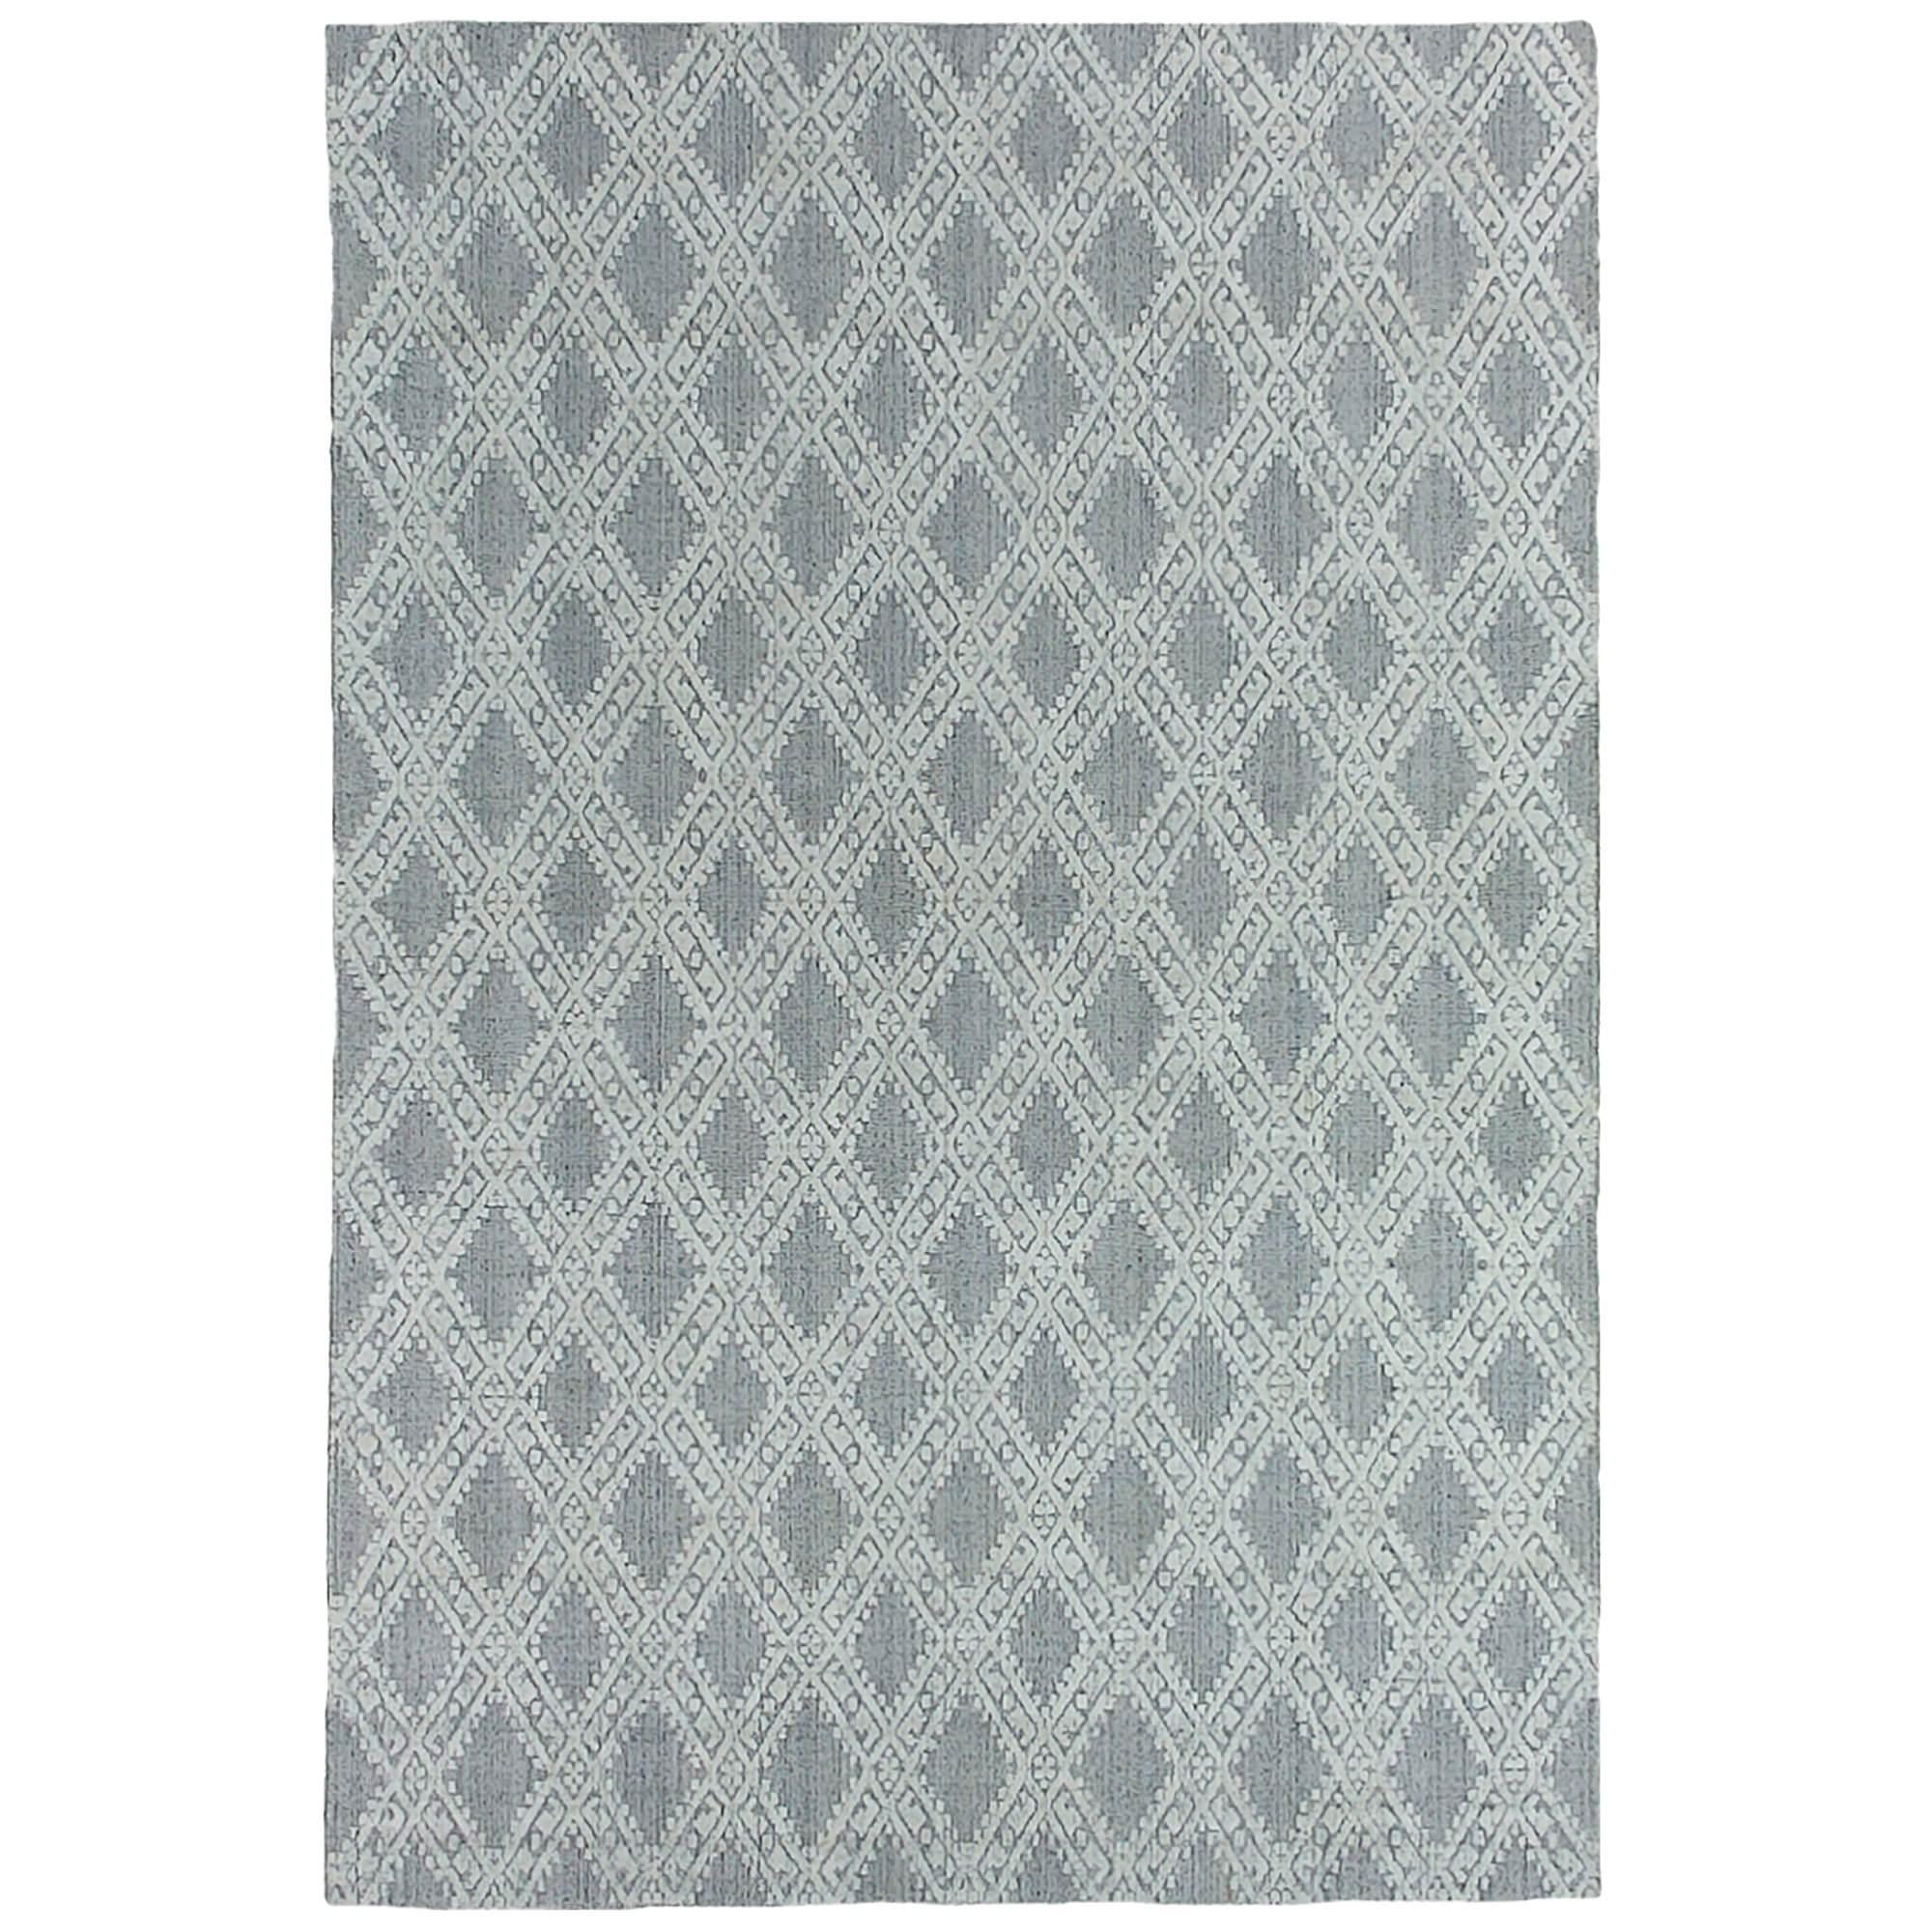 Timeless Elegance Hand Loomed Wool & Viscose Rug, 300x400cm, Natural / Grey